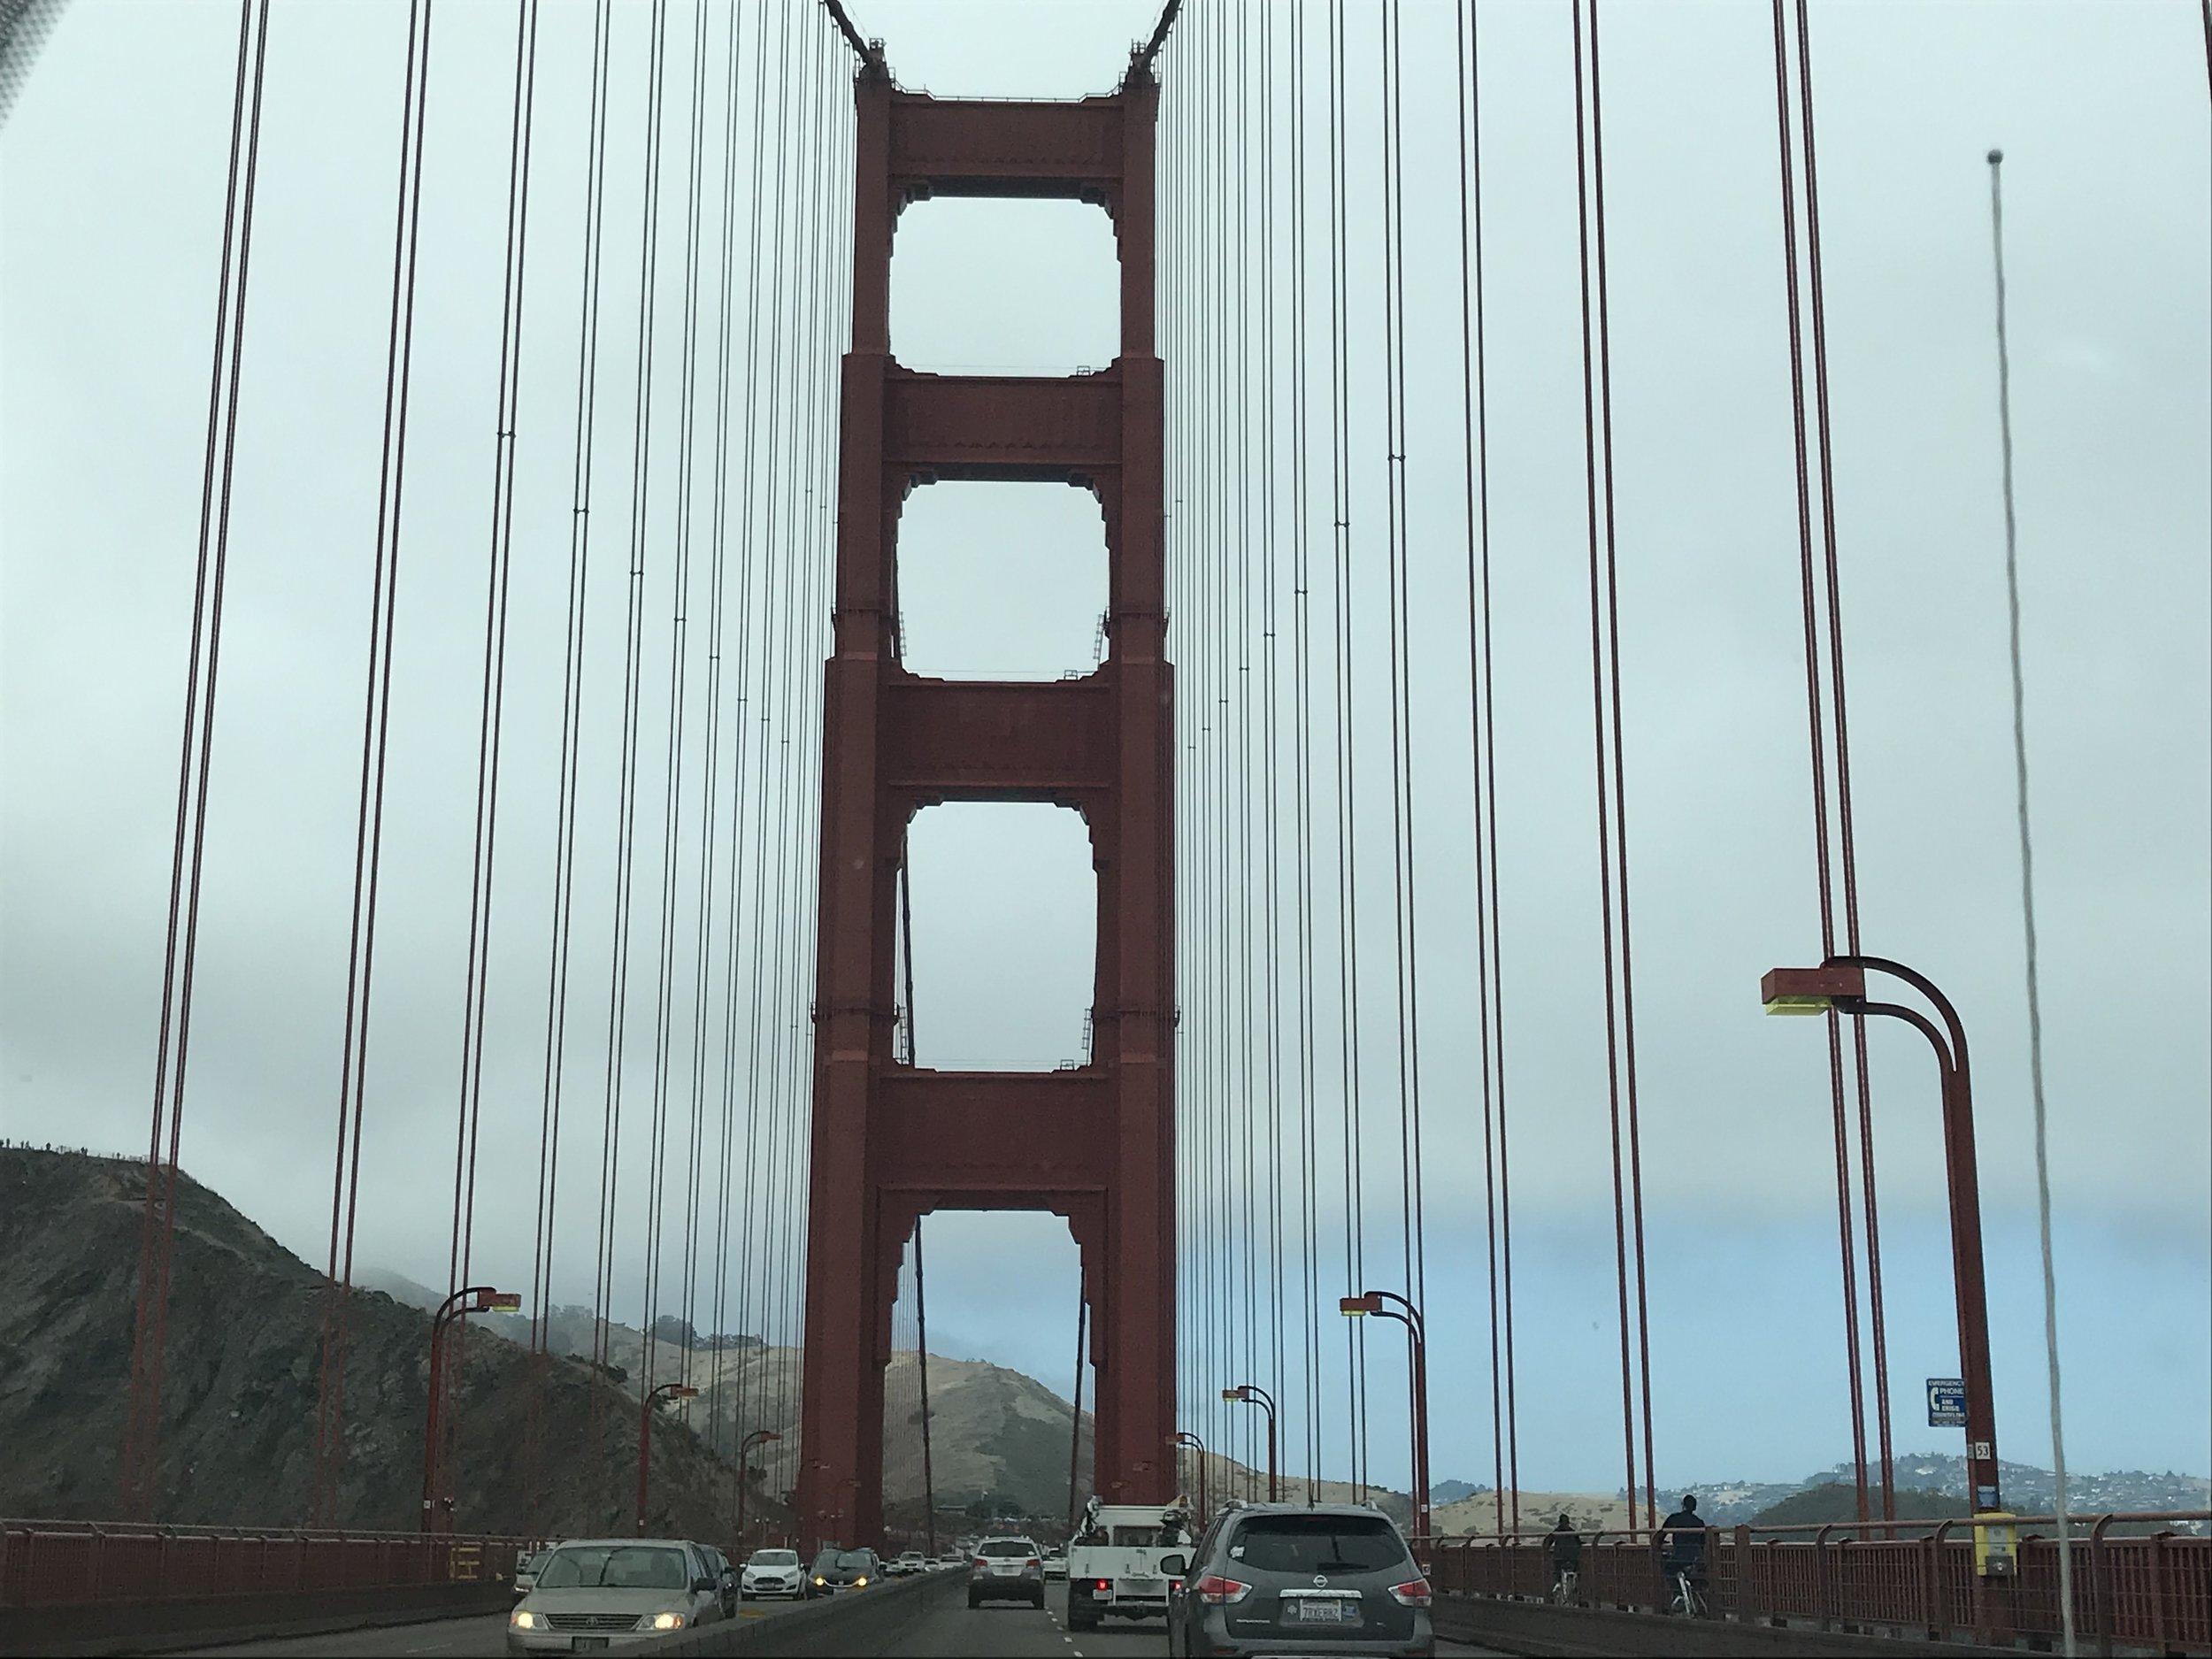 Leaving San Francisco via the Golden Gate Bridge